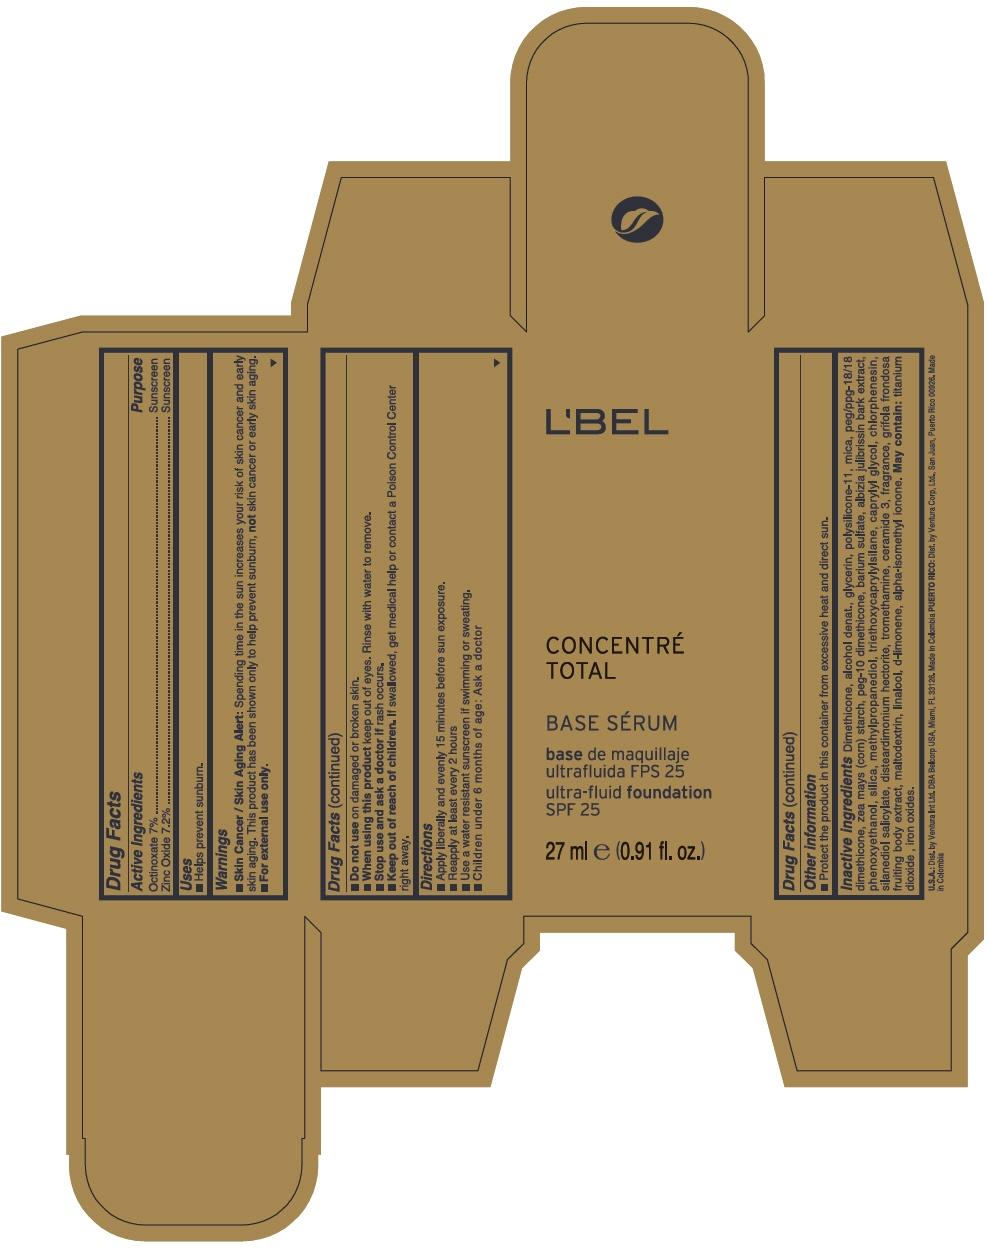 PRINCIPAL DISPLAY PANEL - 27 ml Tube Box - OBSCURE 8 - BEIGE